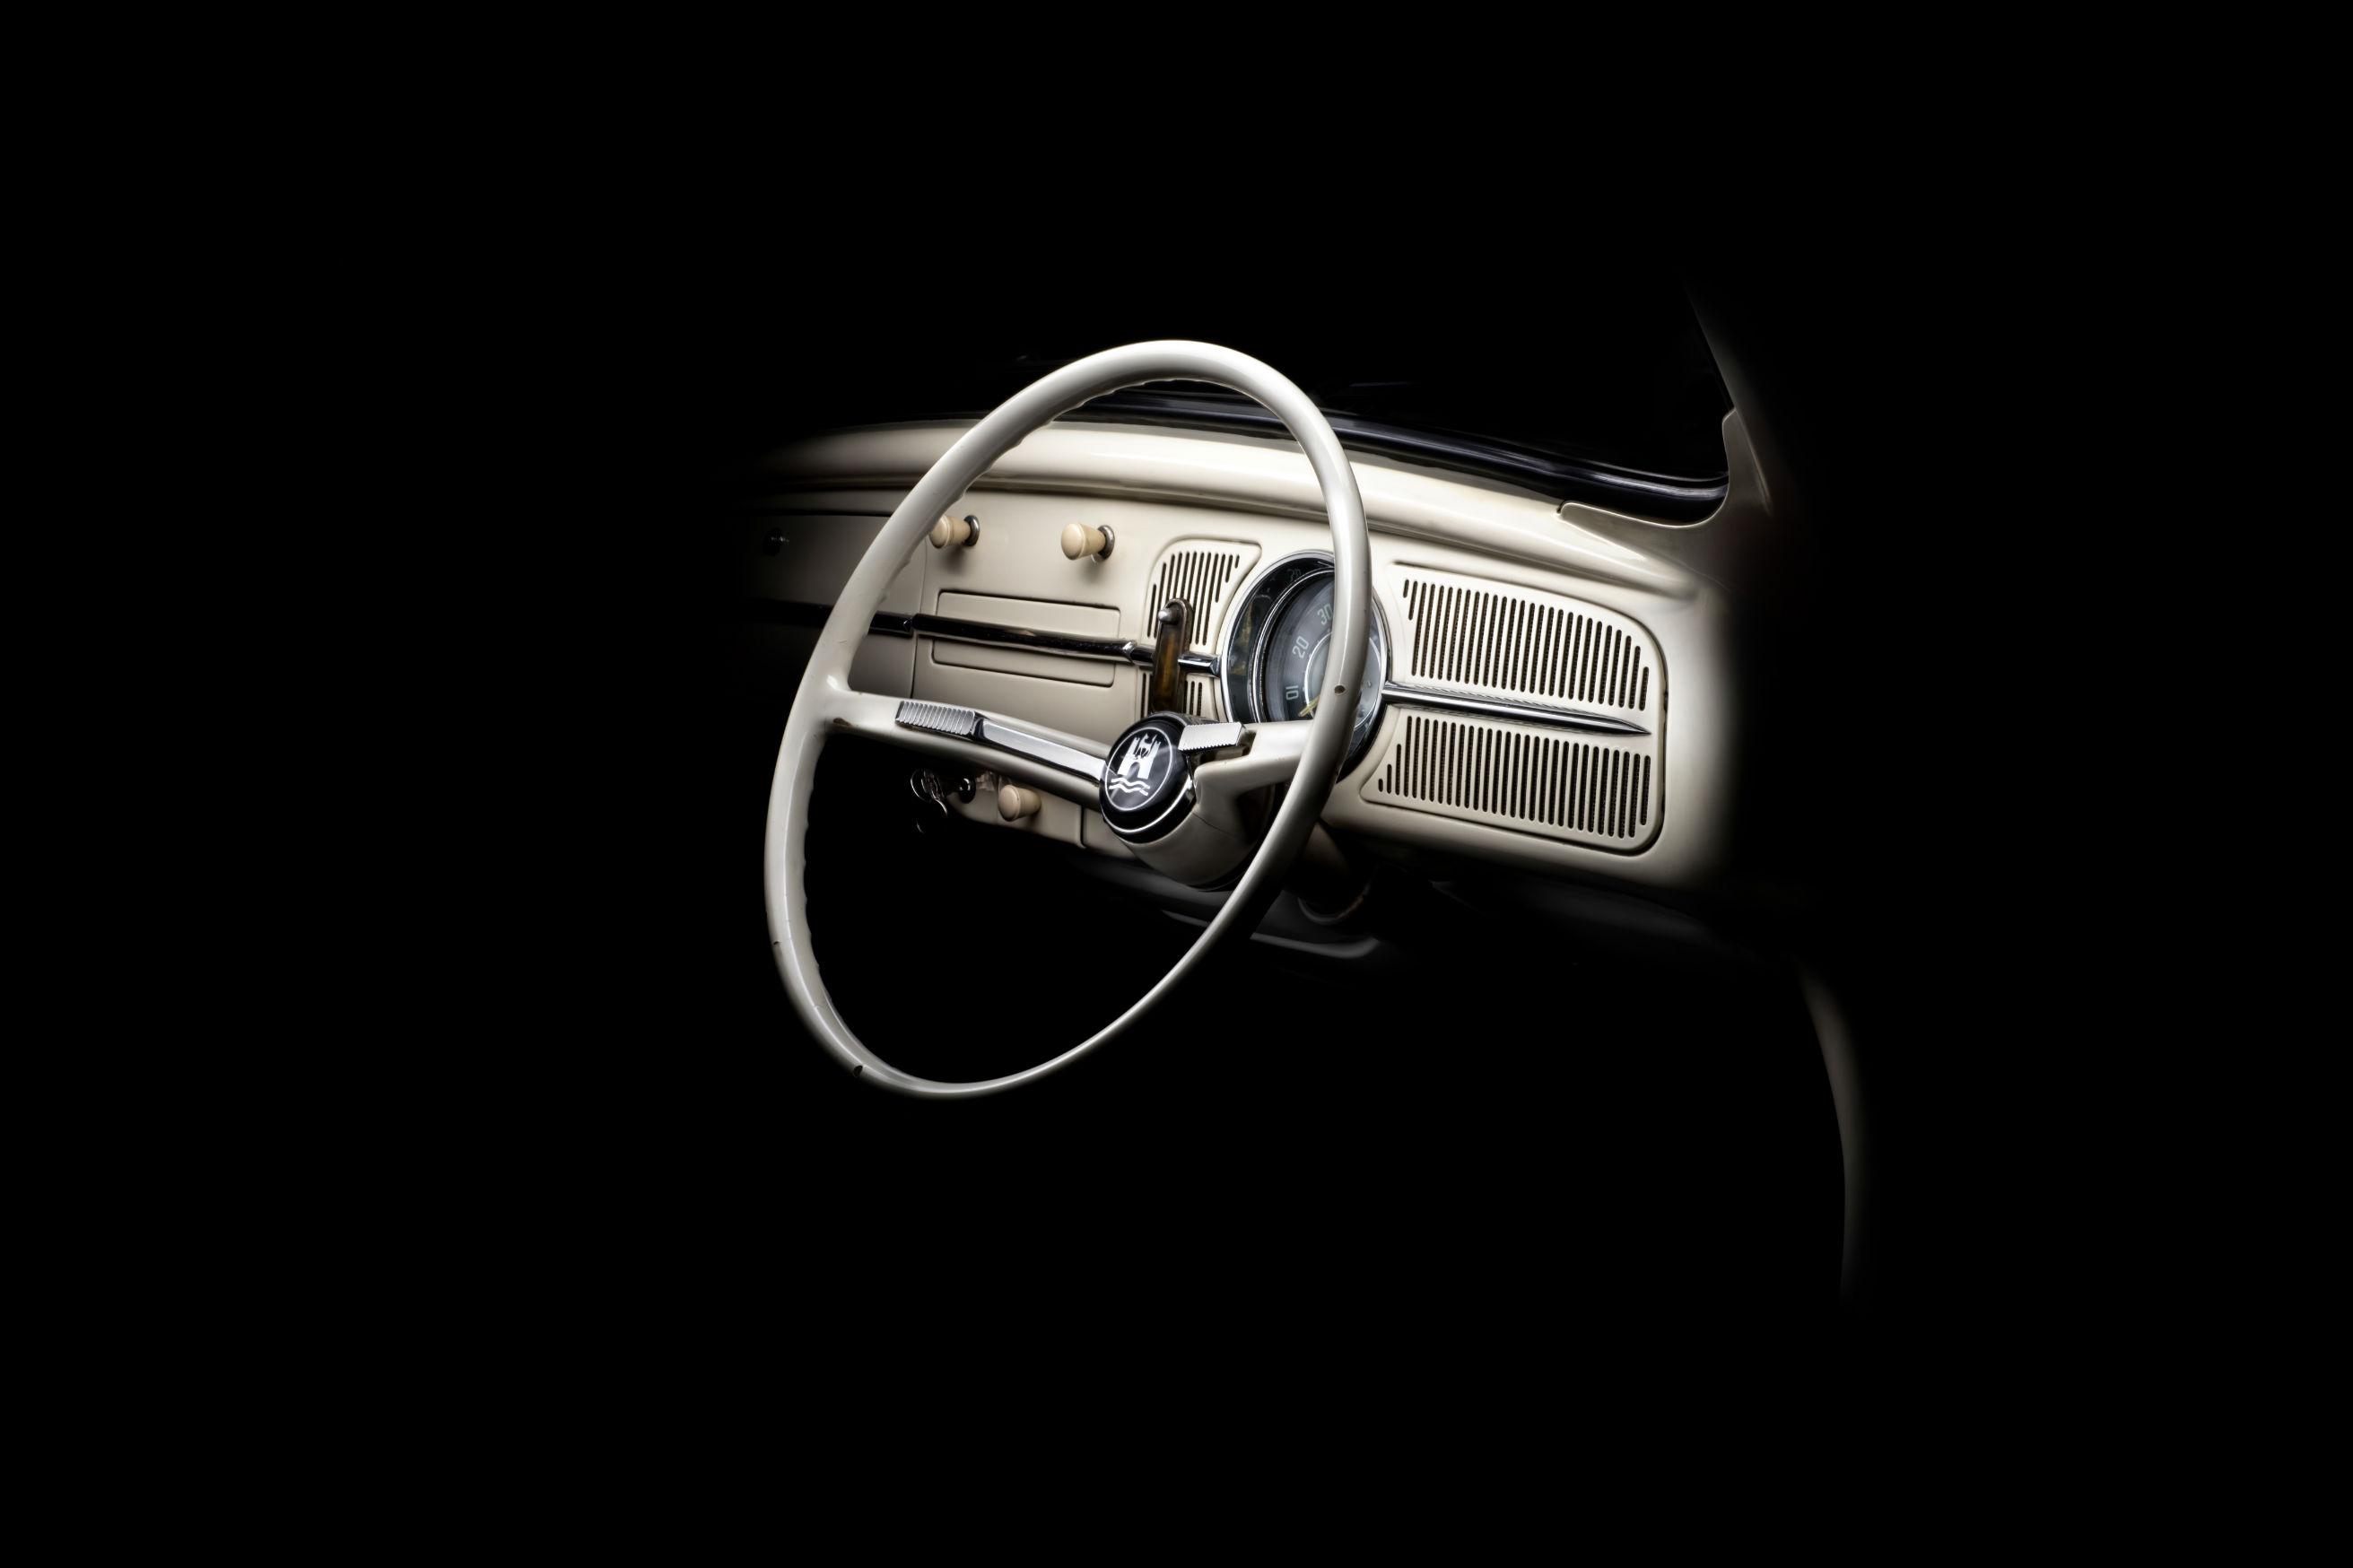 VW Beetle_classic_automotive_5a_sarel_photowise-001-small